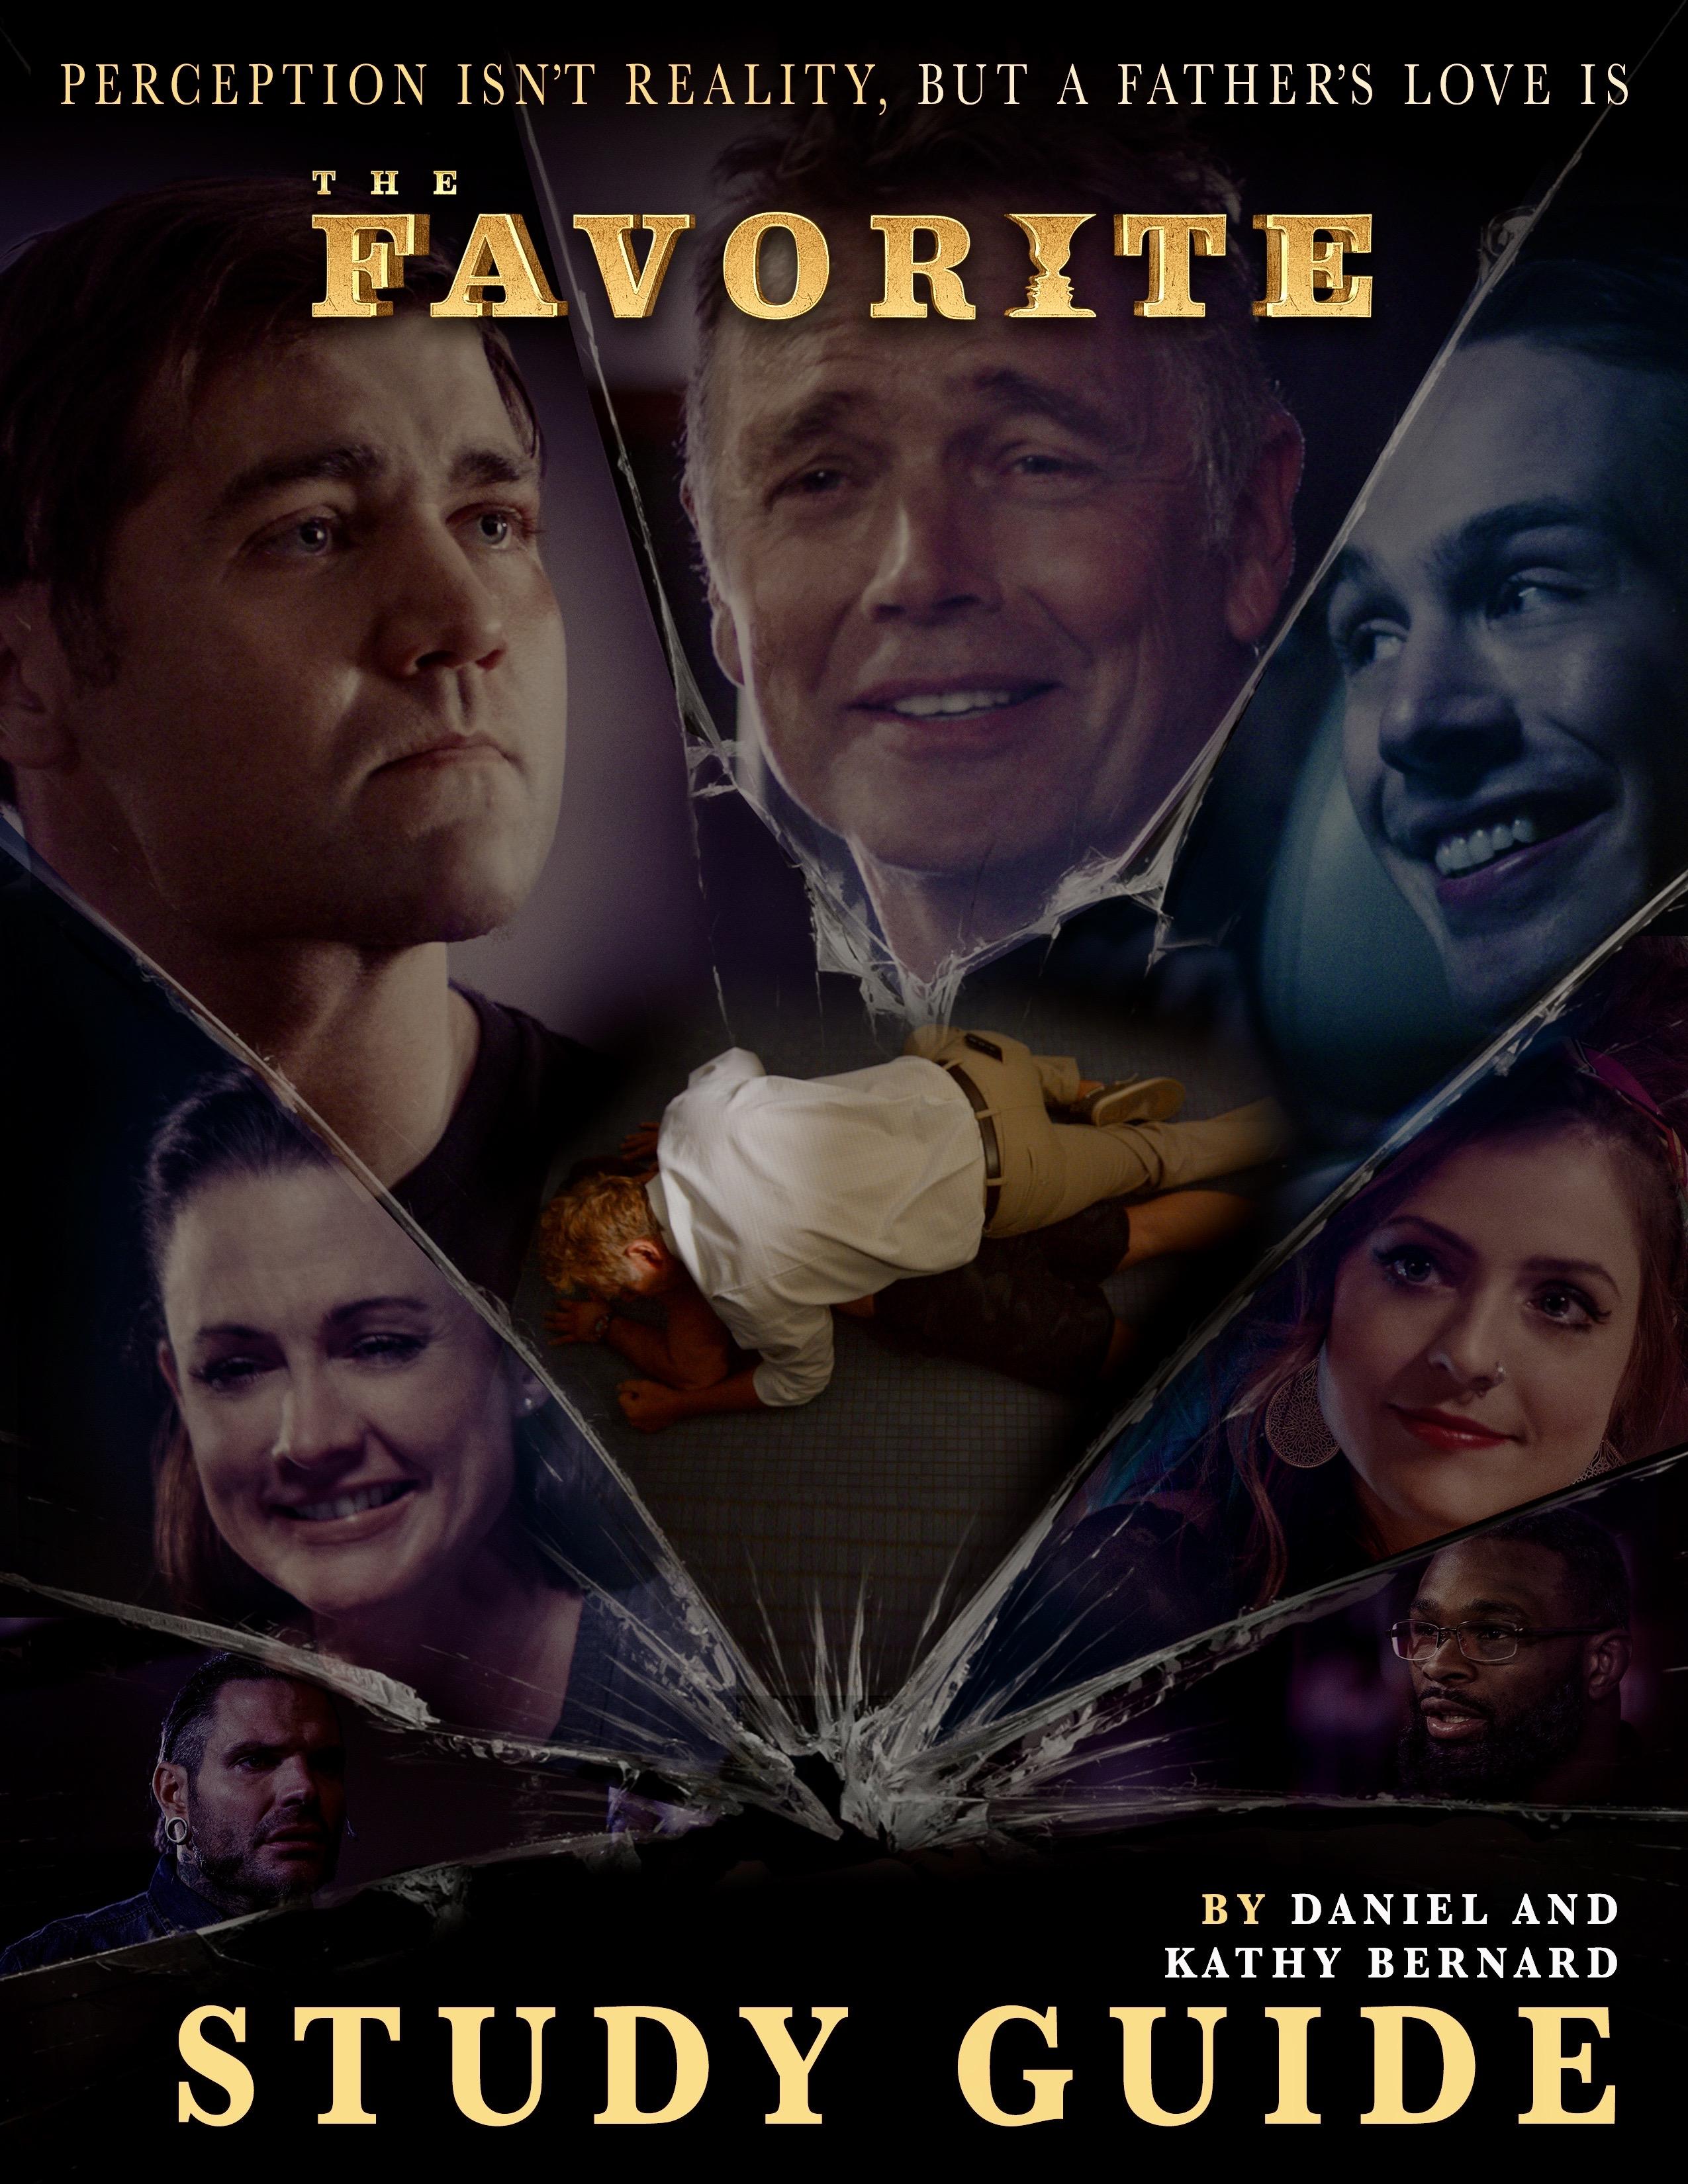 Watch Movie The Favorite